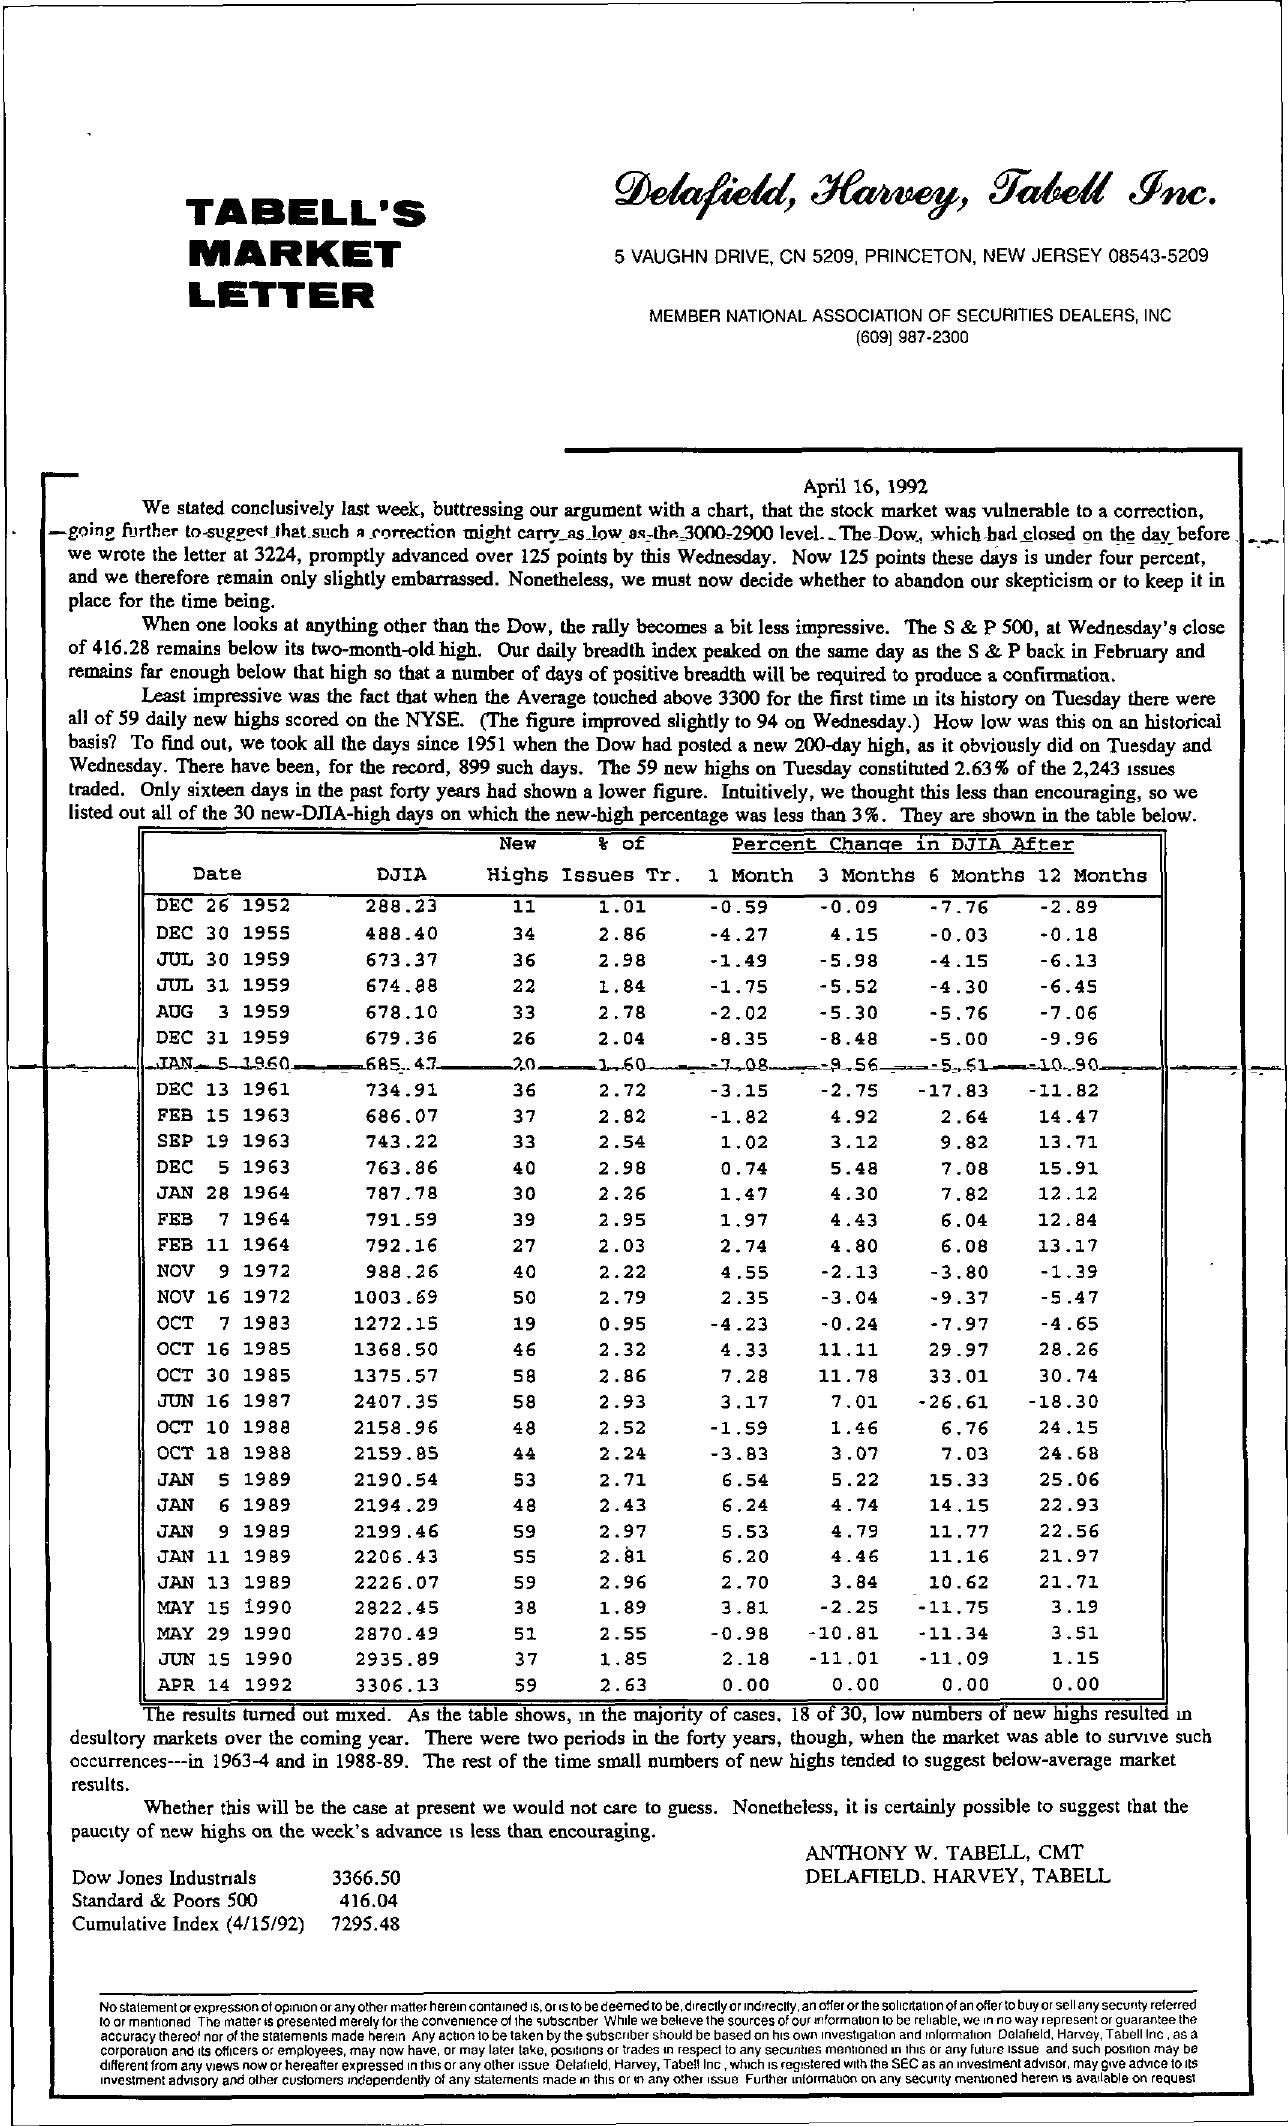 Tabell's Market Letter - April 16, 1992